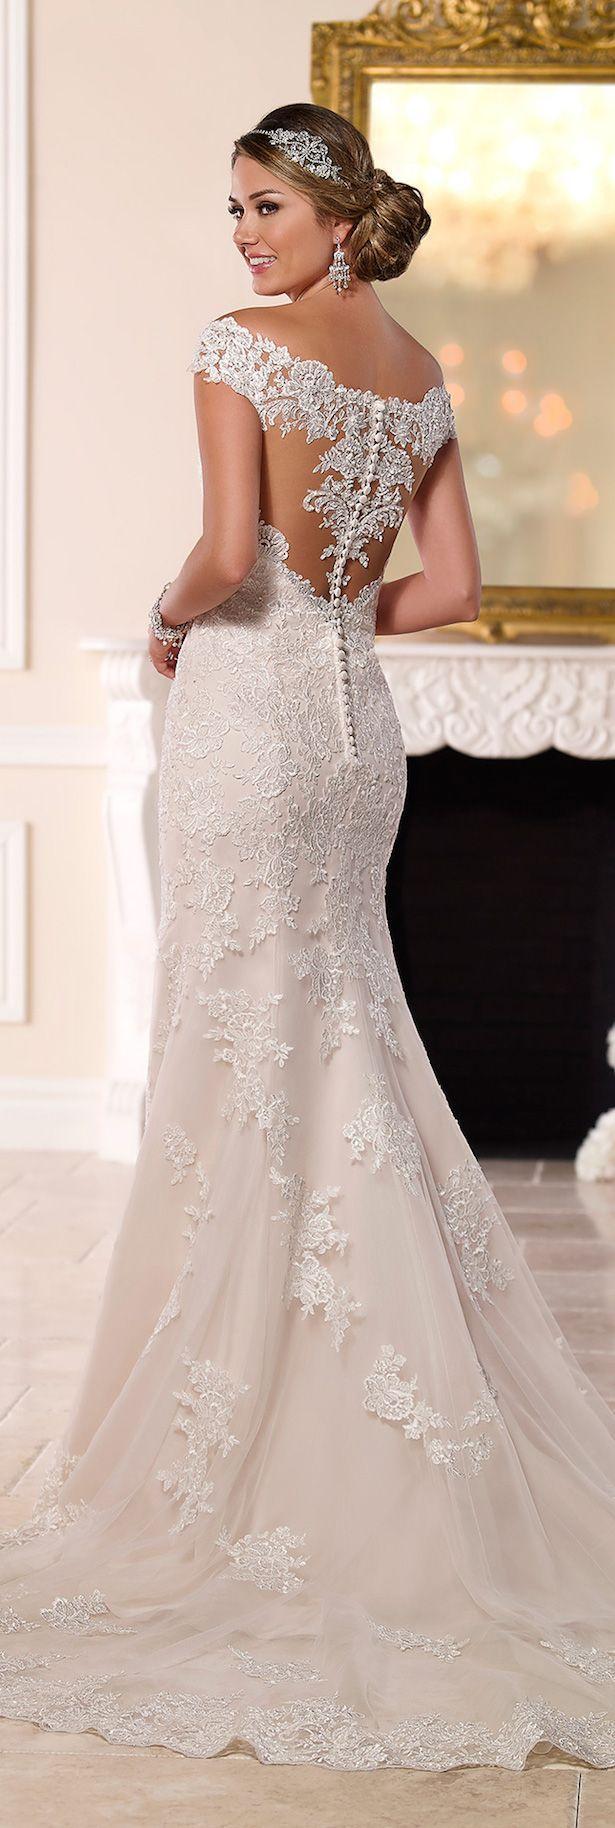 best dresses images on pinterest wedding dressses homecoming